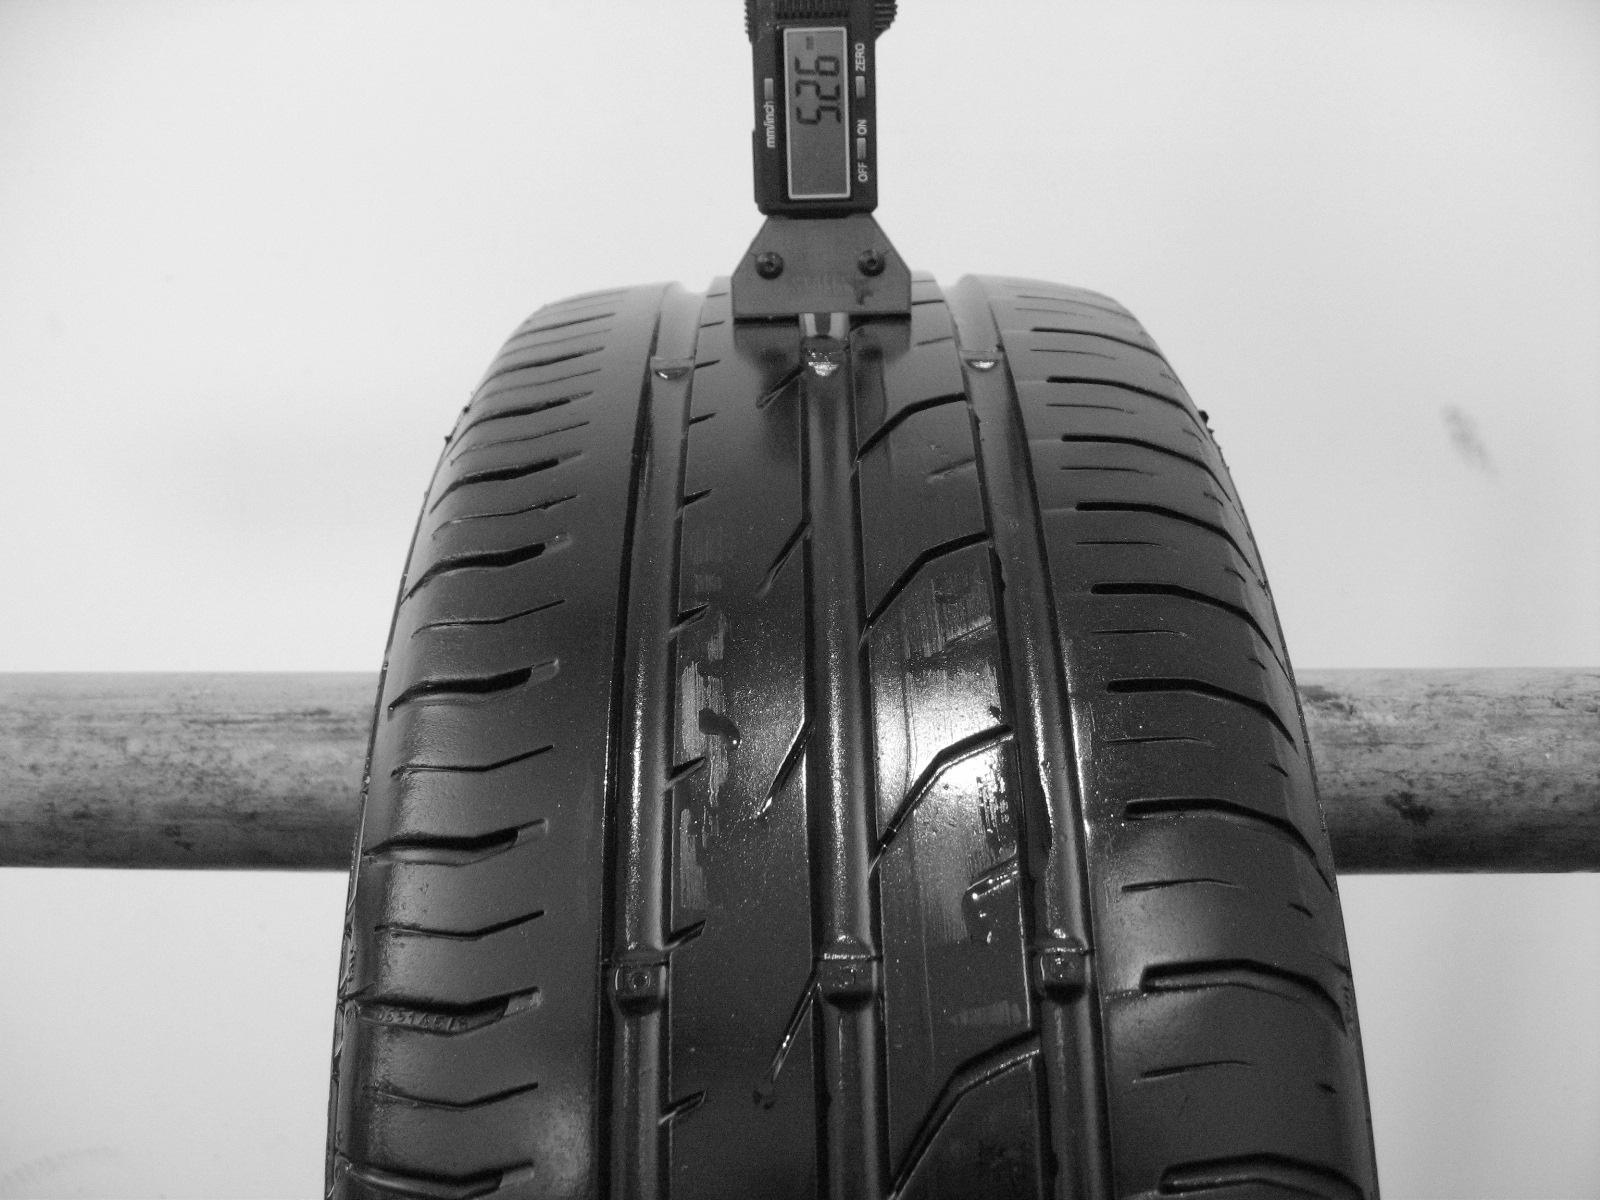 Použité-Pneu-Bazar - 195/60 R15 CONTINENTAL CONTIPREMIUMCONTACT 2 88H -kusovka-rezerva 4mm